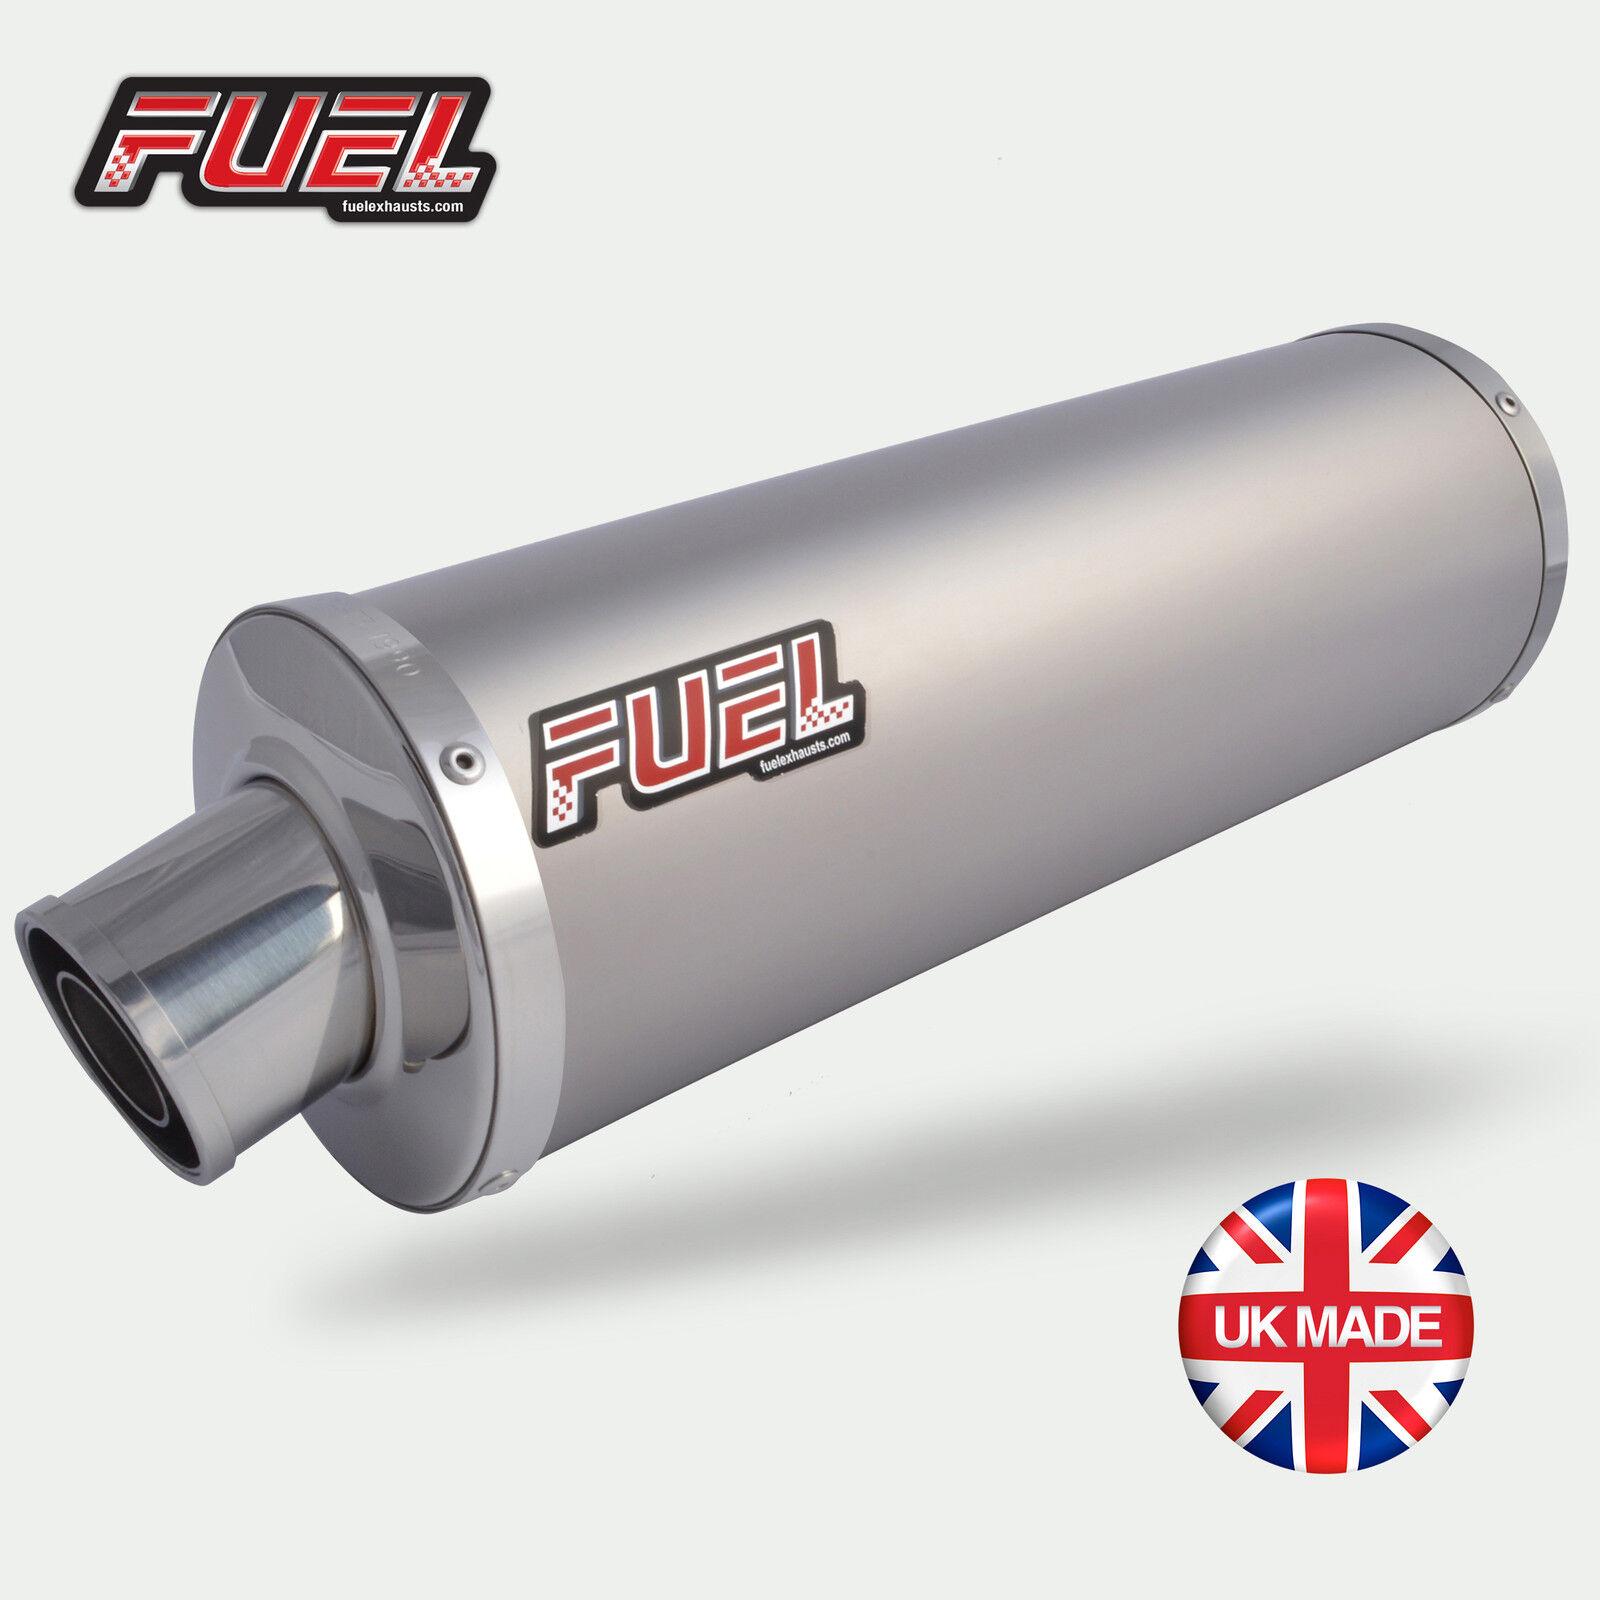 Sfv 650 Gladius 09 + Klassisch Uni Uni Uni Titan Runder Mikromini UK Zugelassener 1cdb3e